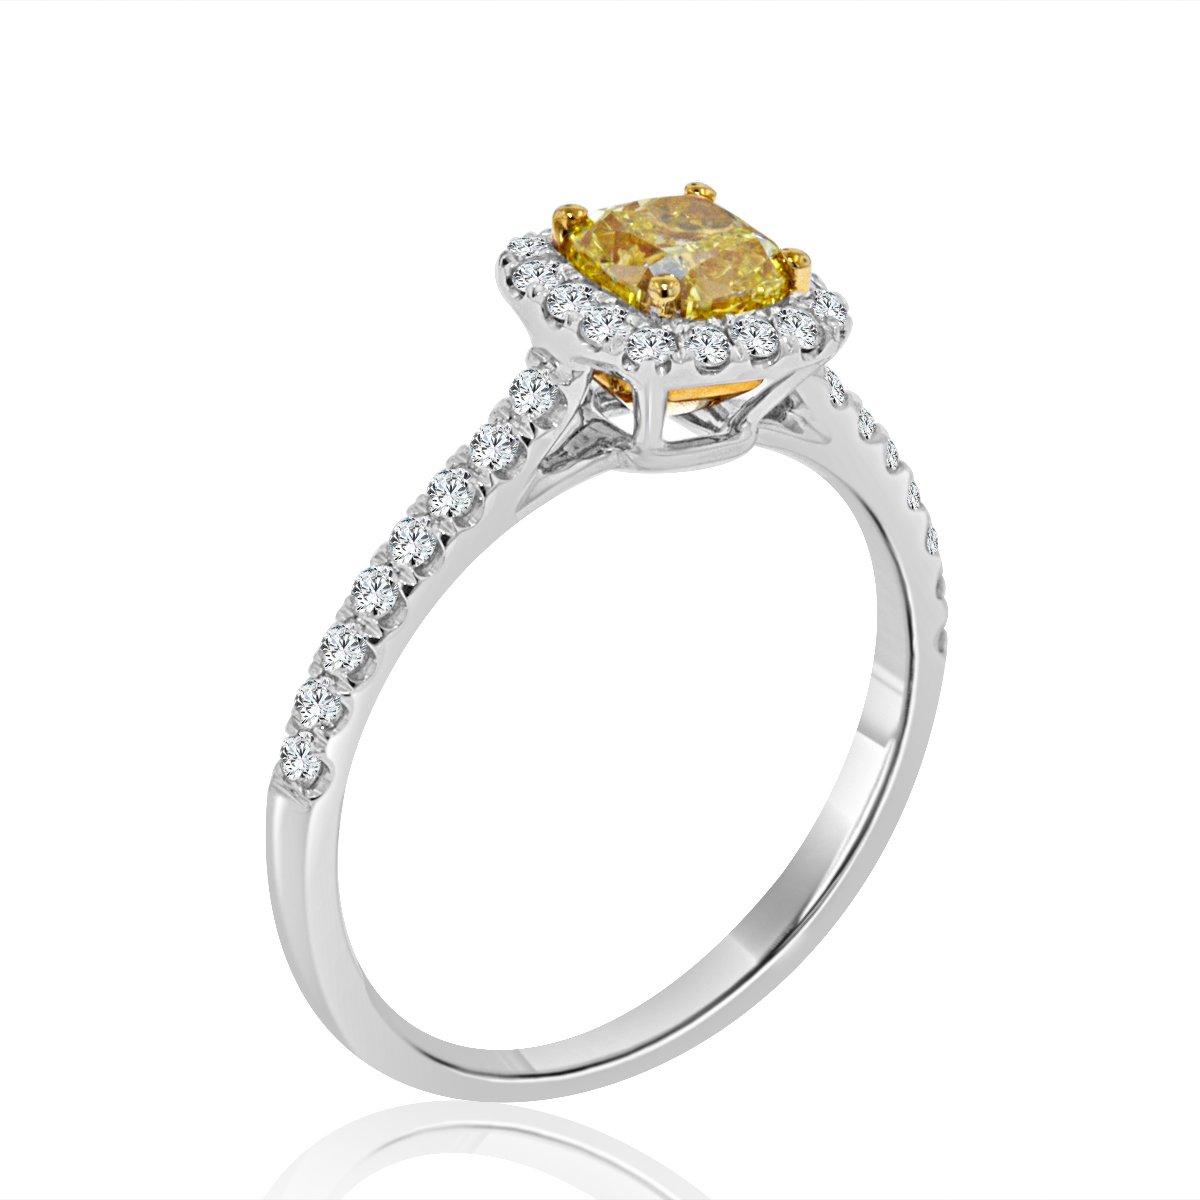 5f0a45eea Arthurs Collection Diamond Yellow Gold Womens Wedding bands ...